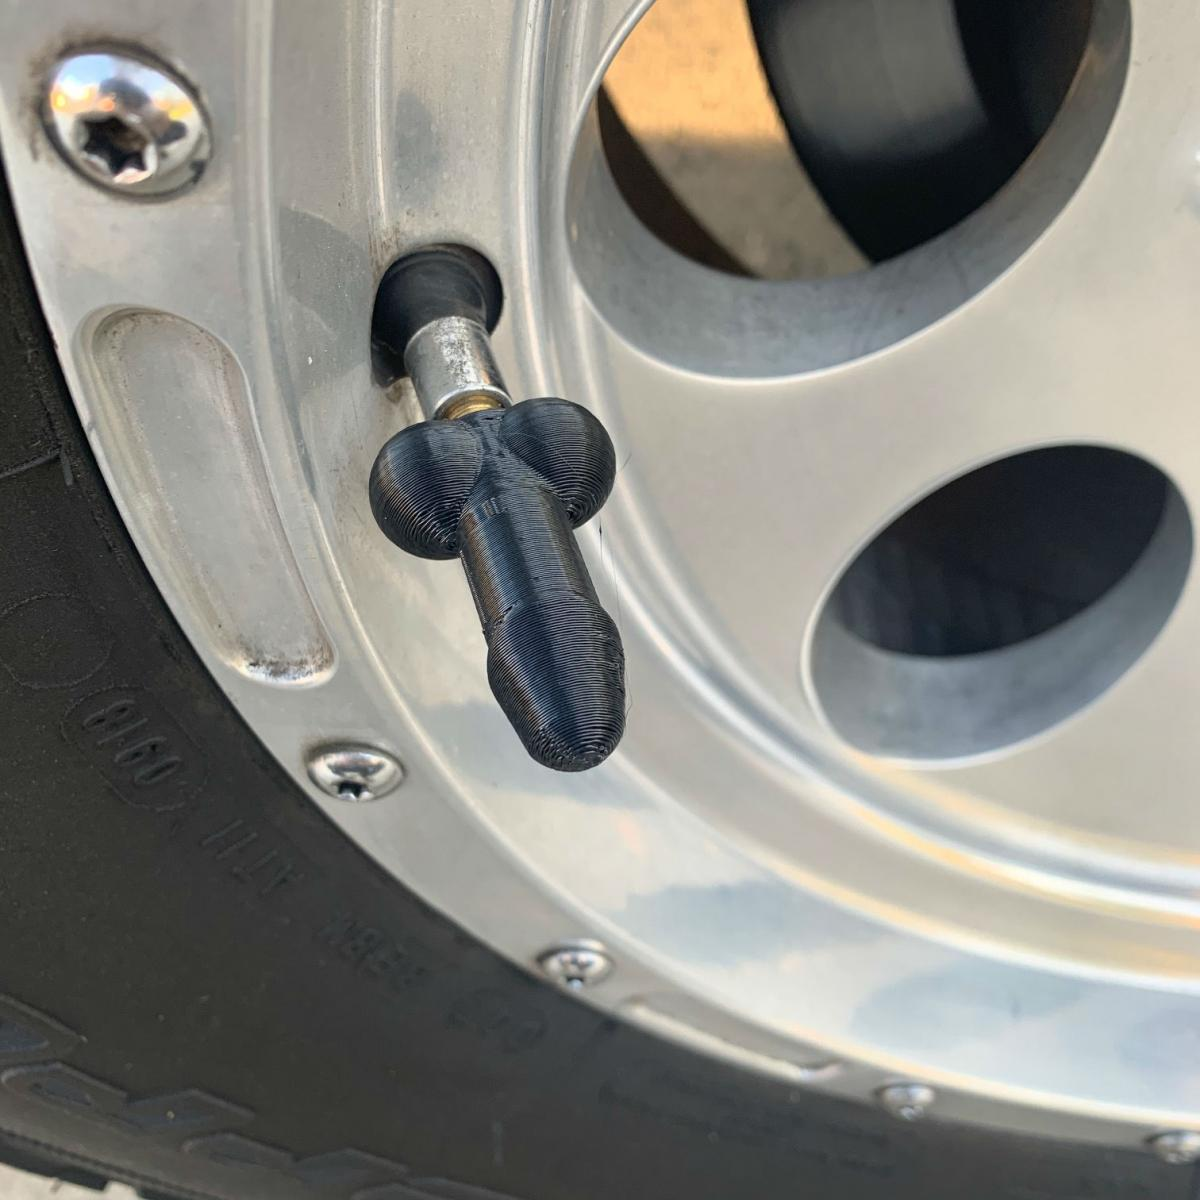 prank-wiener-shaped-tire-valve-stem-caps-6806.jpg